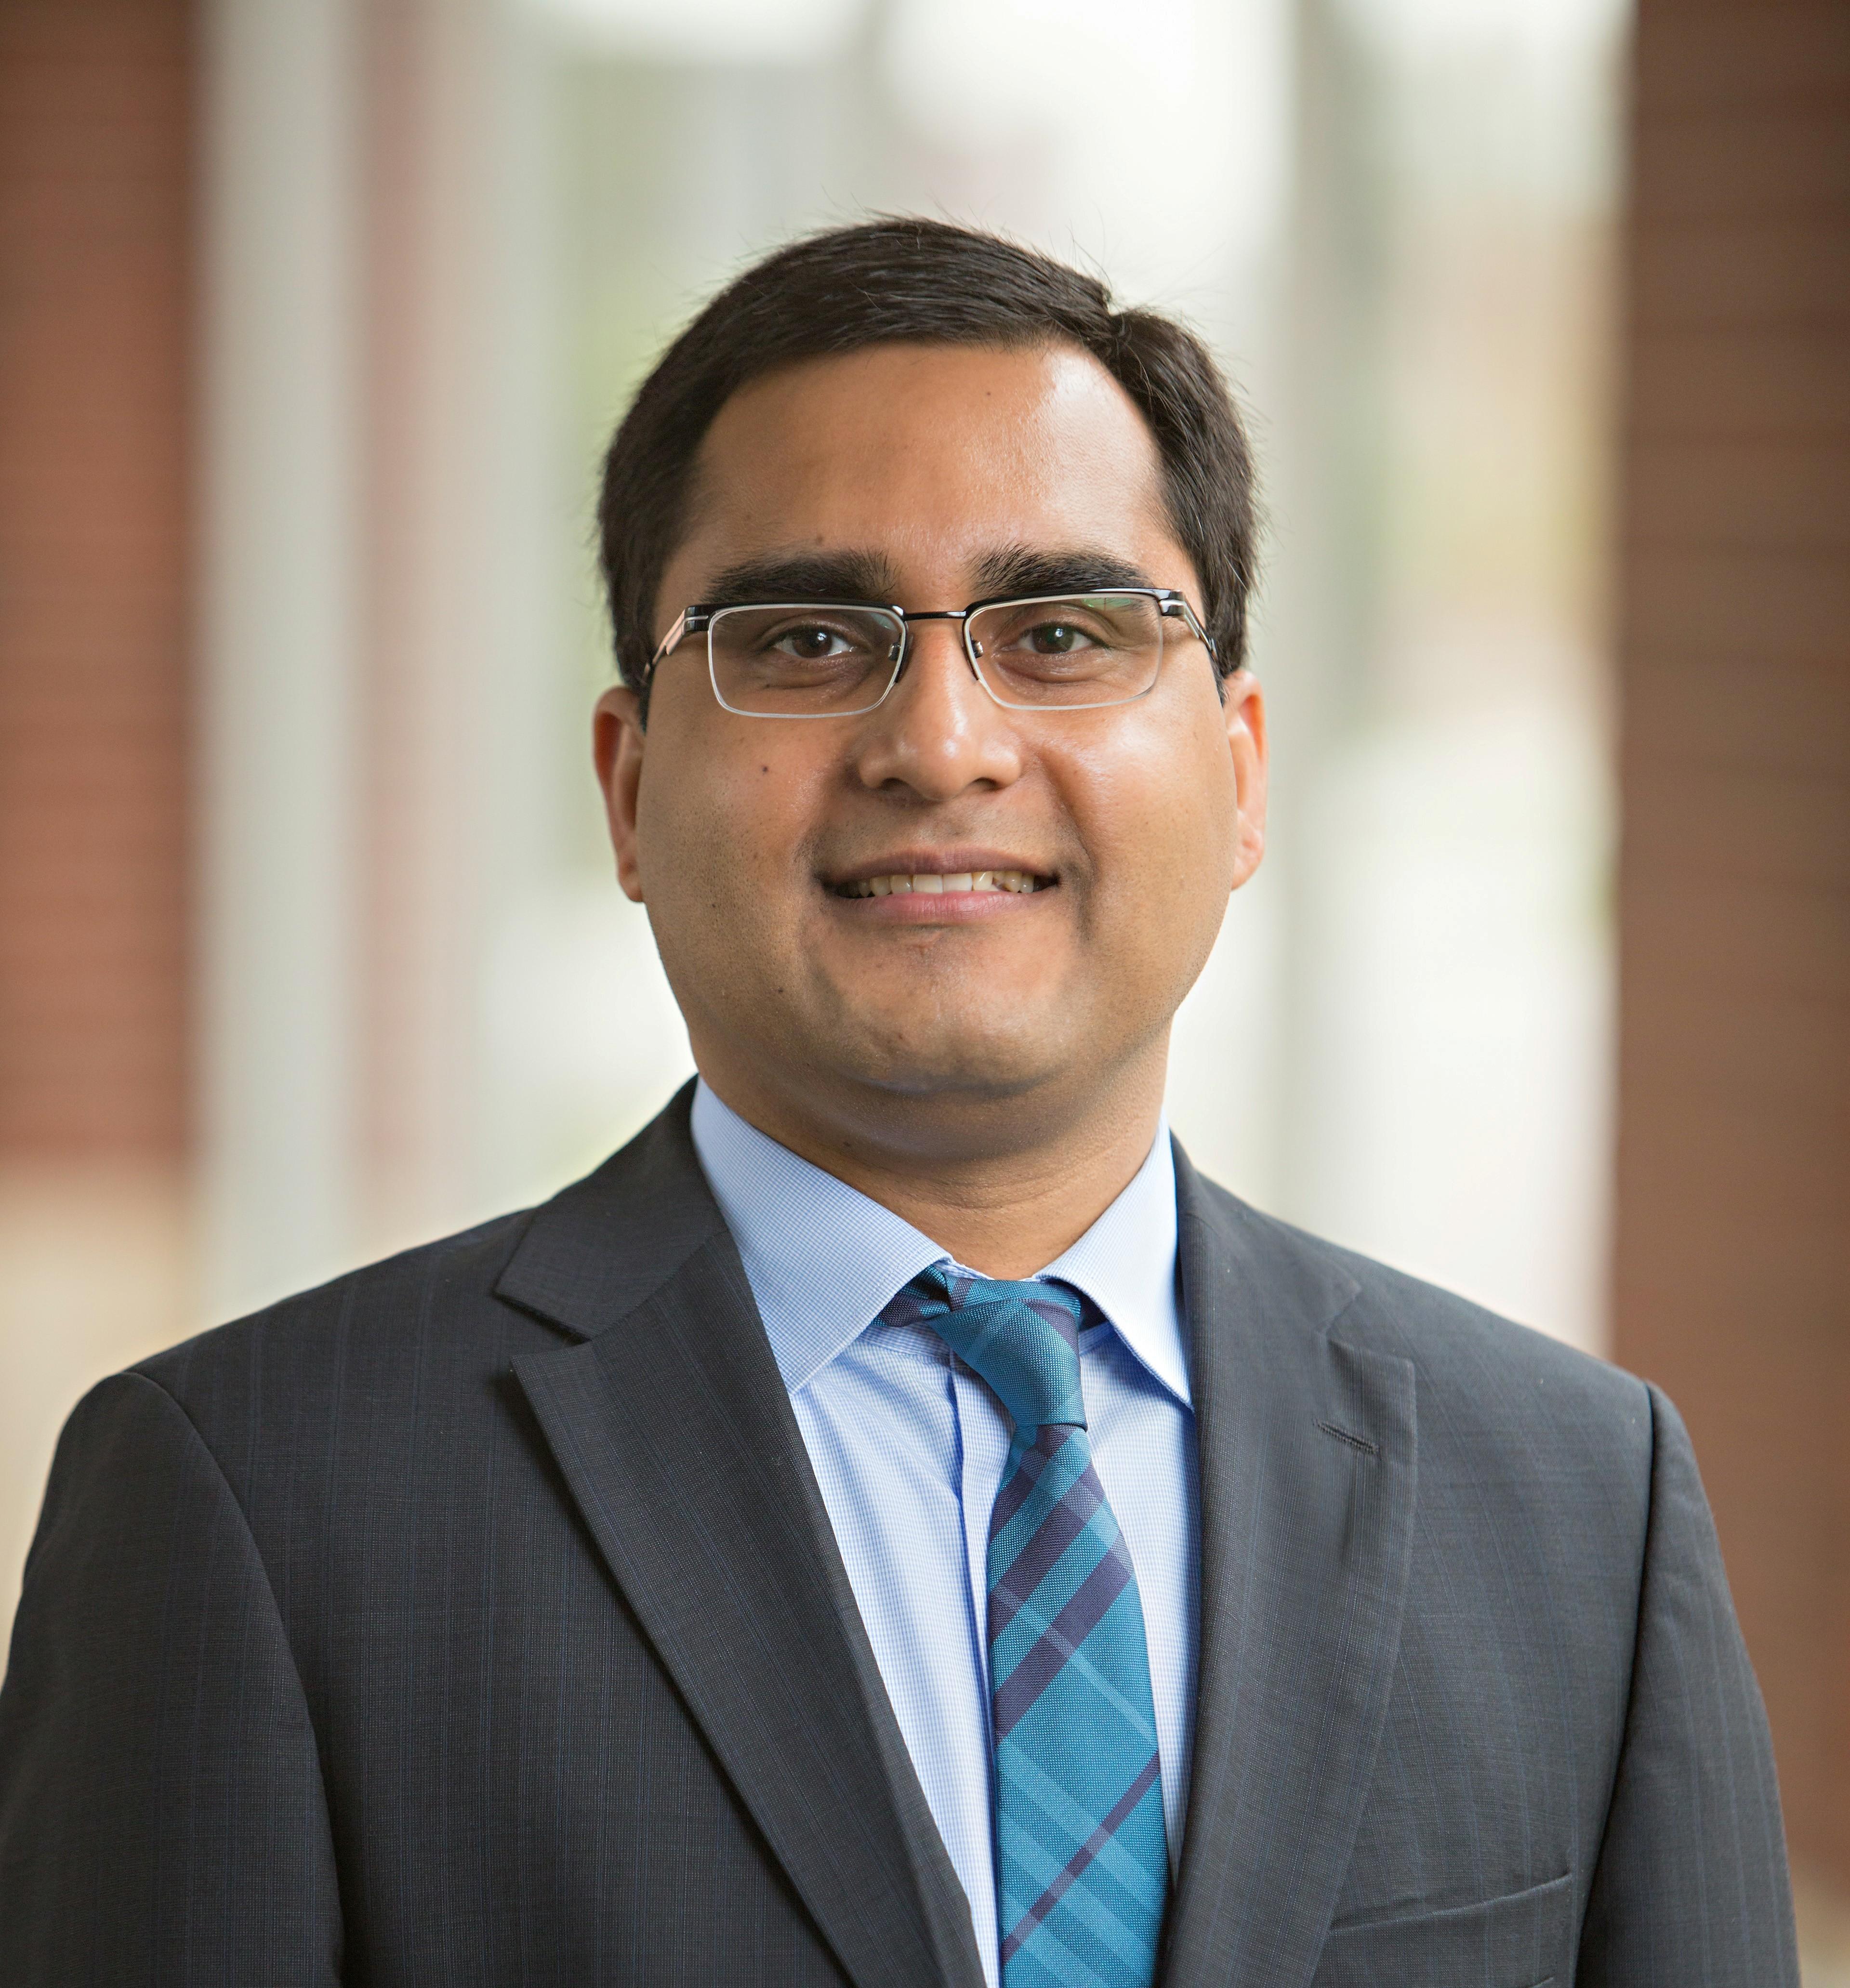 Tauseef Ali, MD, FACG